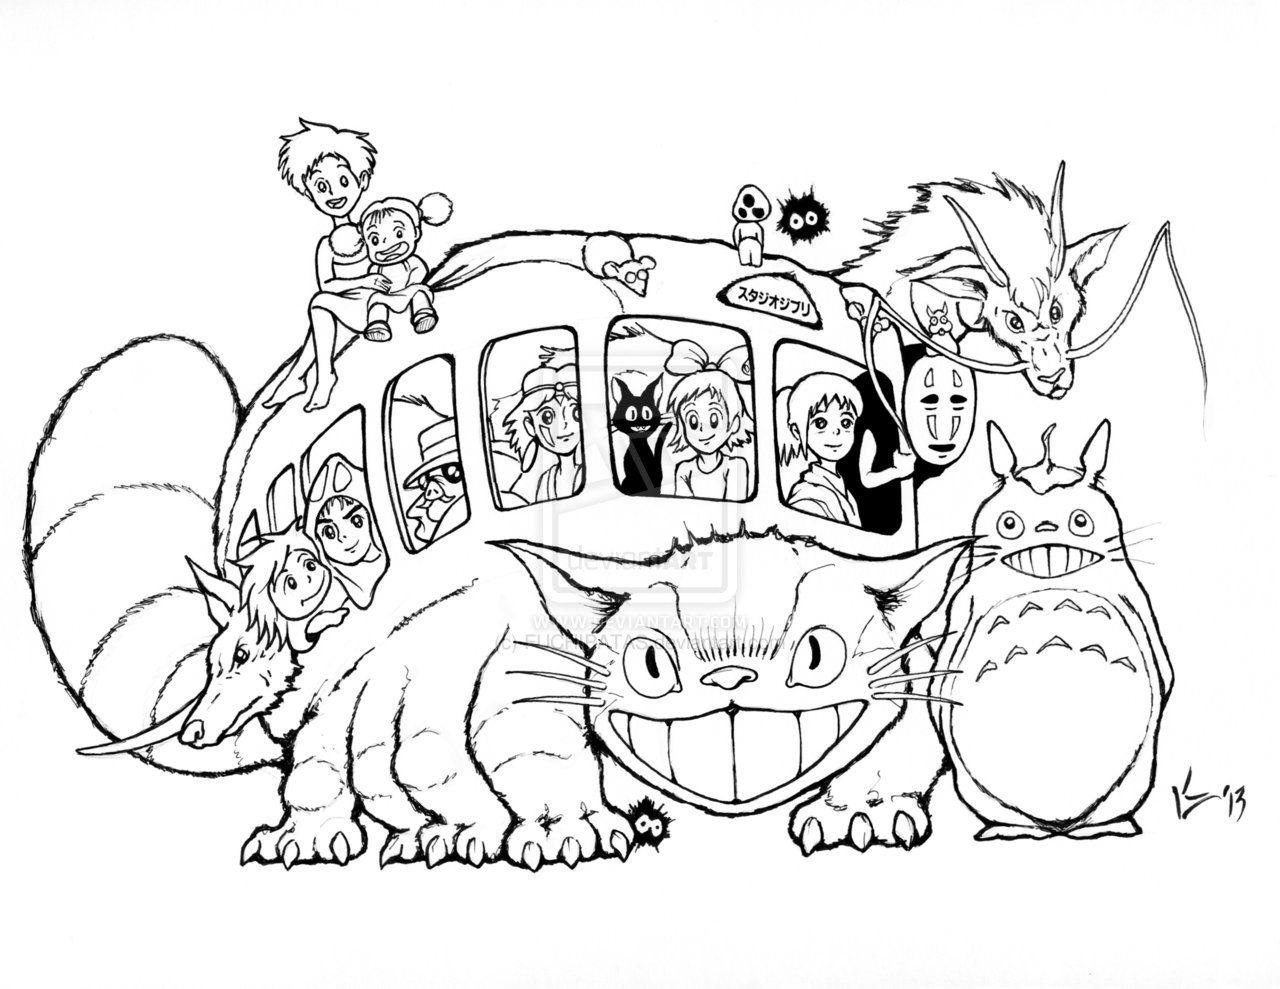 1280x989 Studio Ghibli Catbus For Aicn Contest